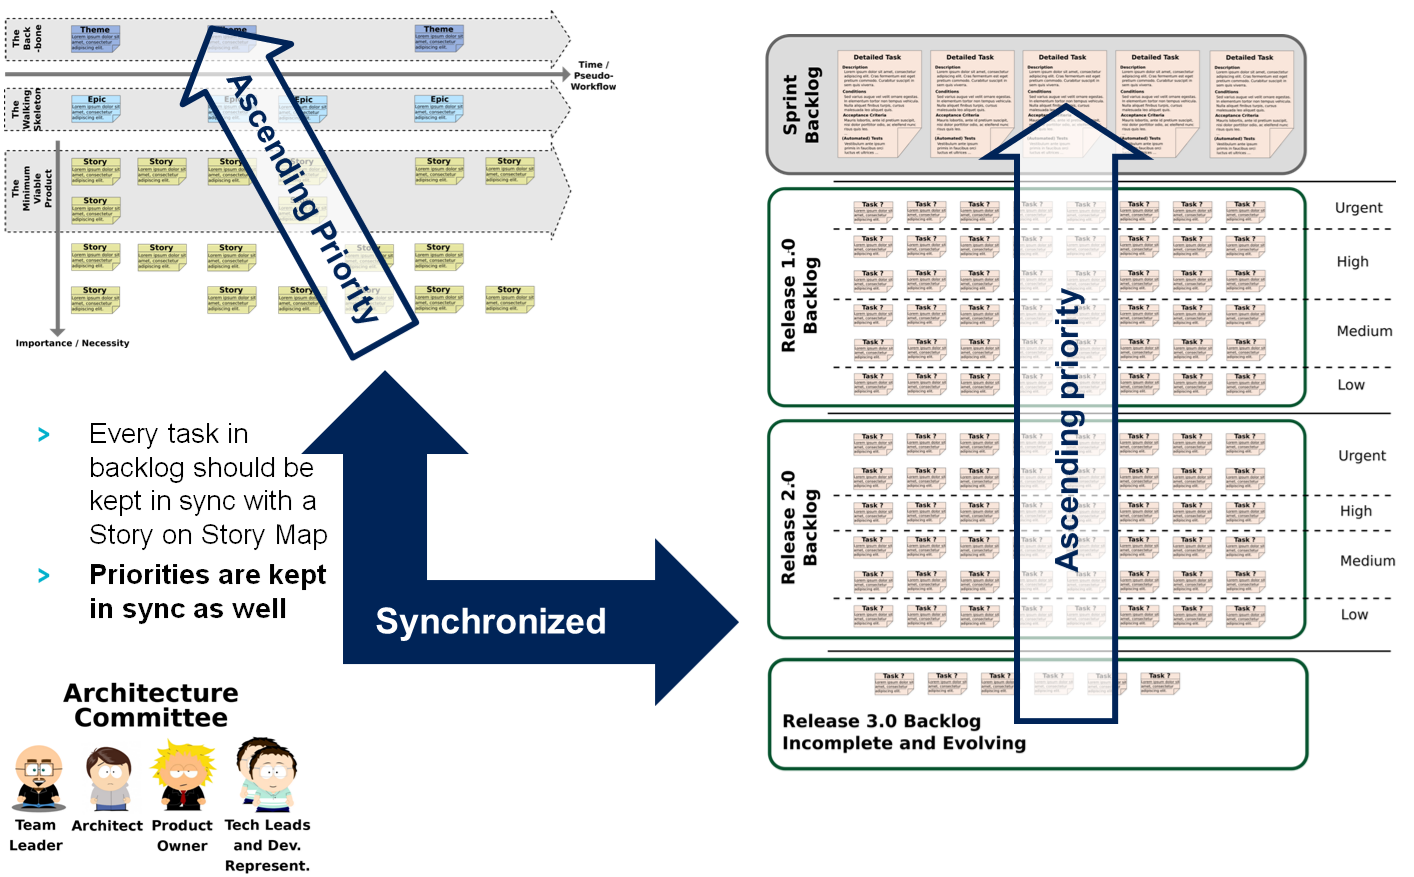 Backlog and Story Map synchronization principle